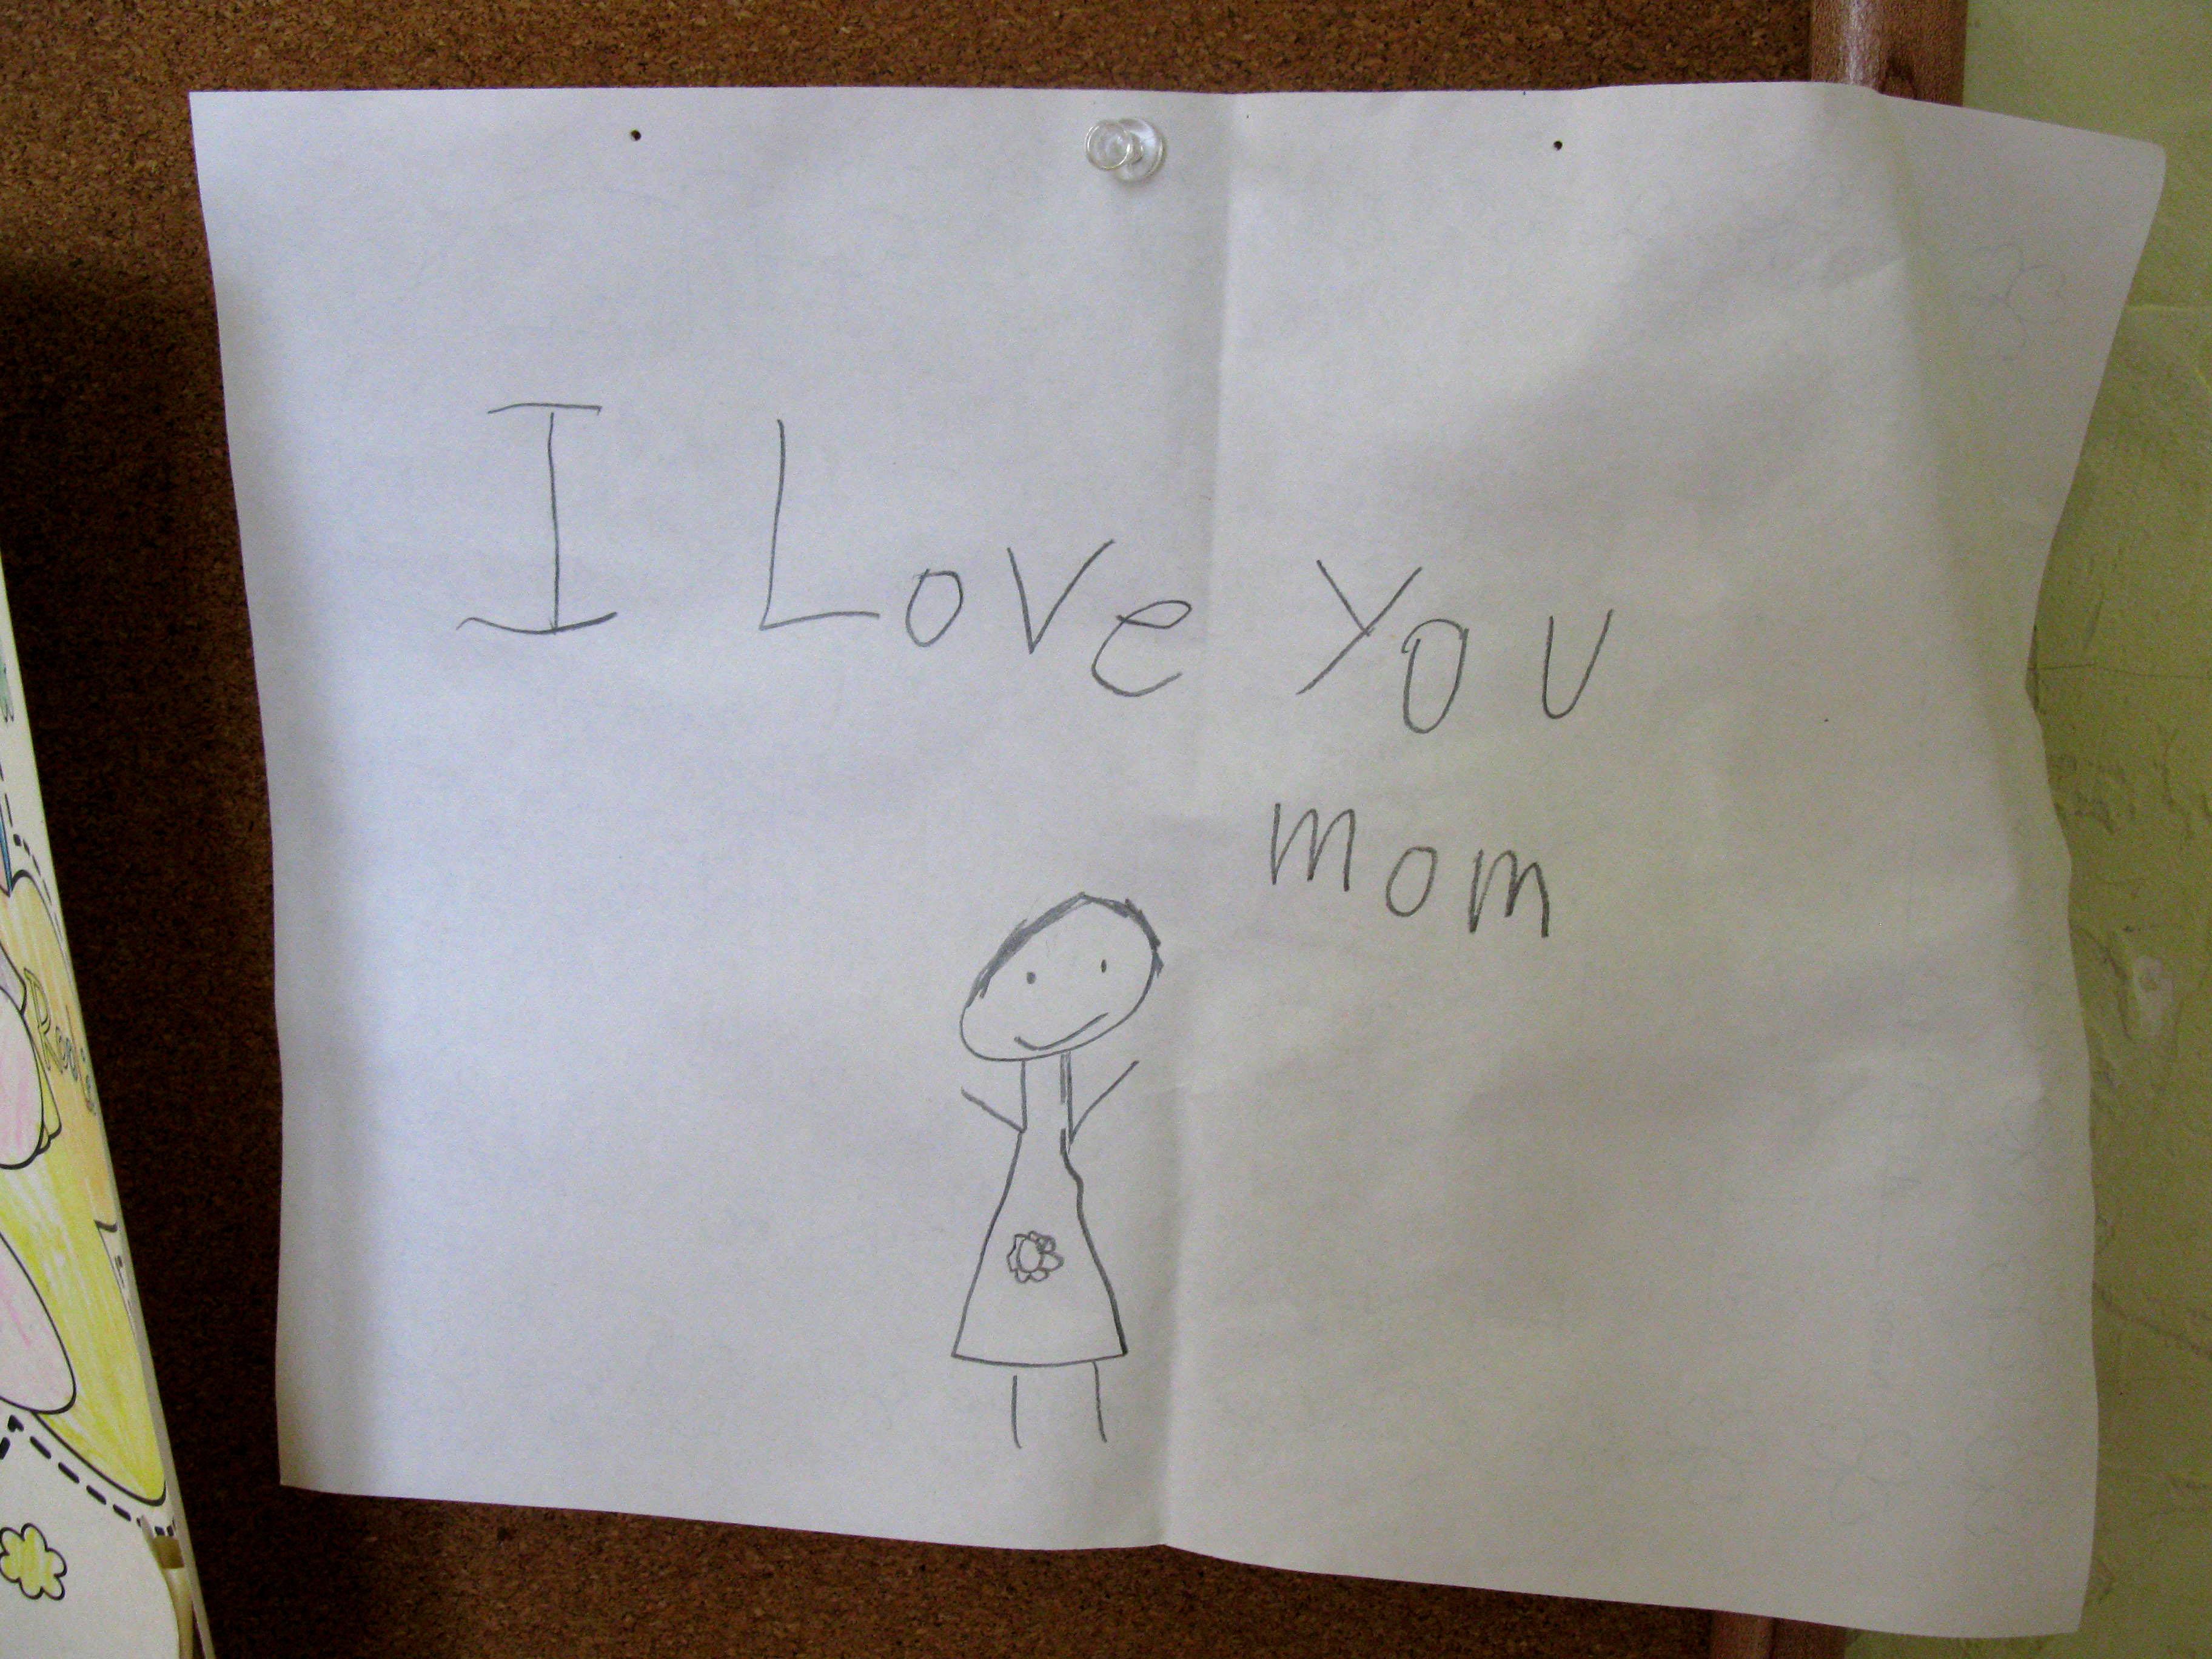 I love you written 100 times